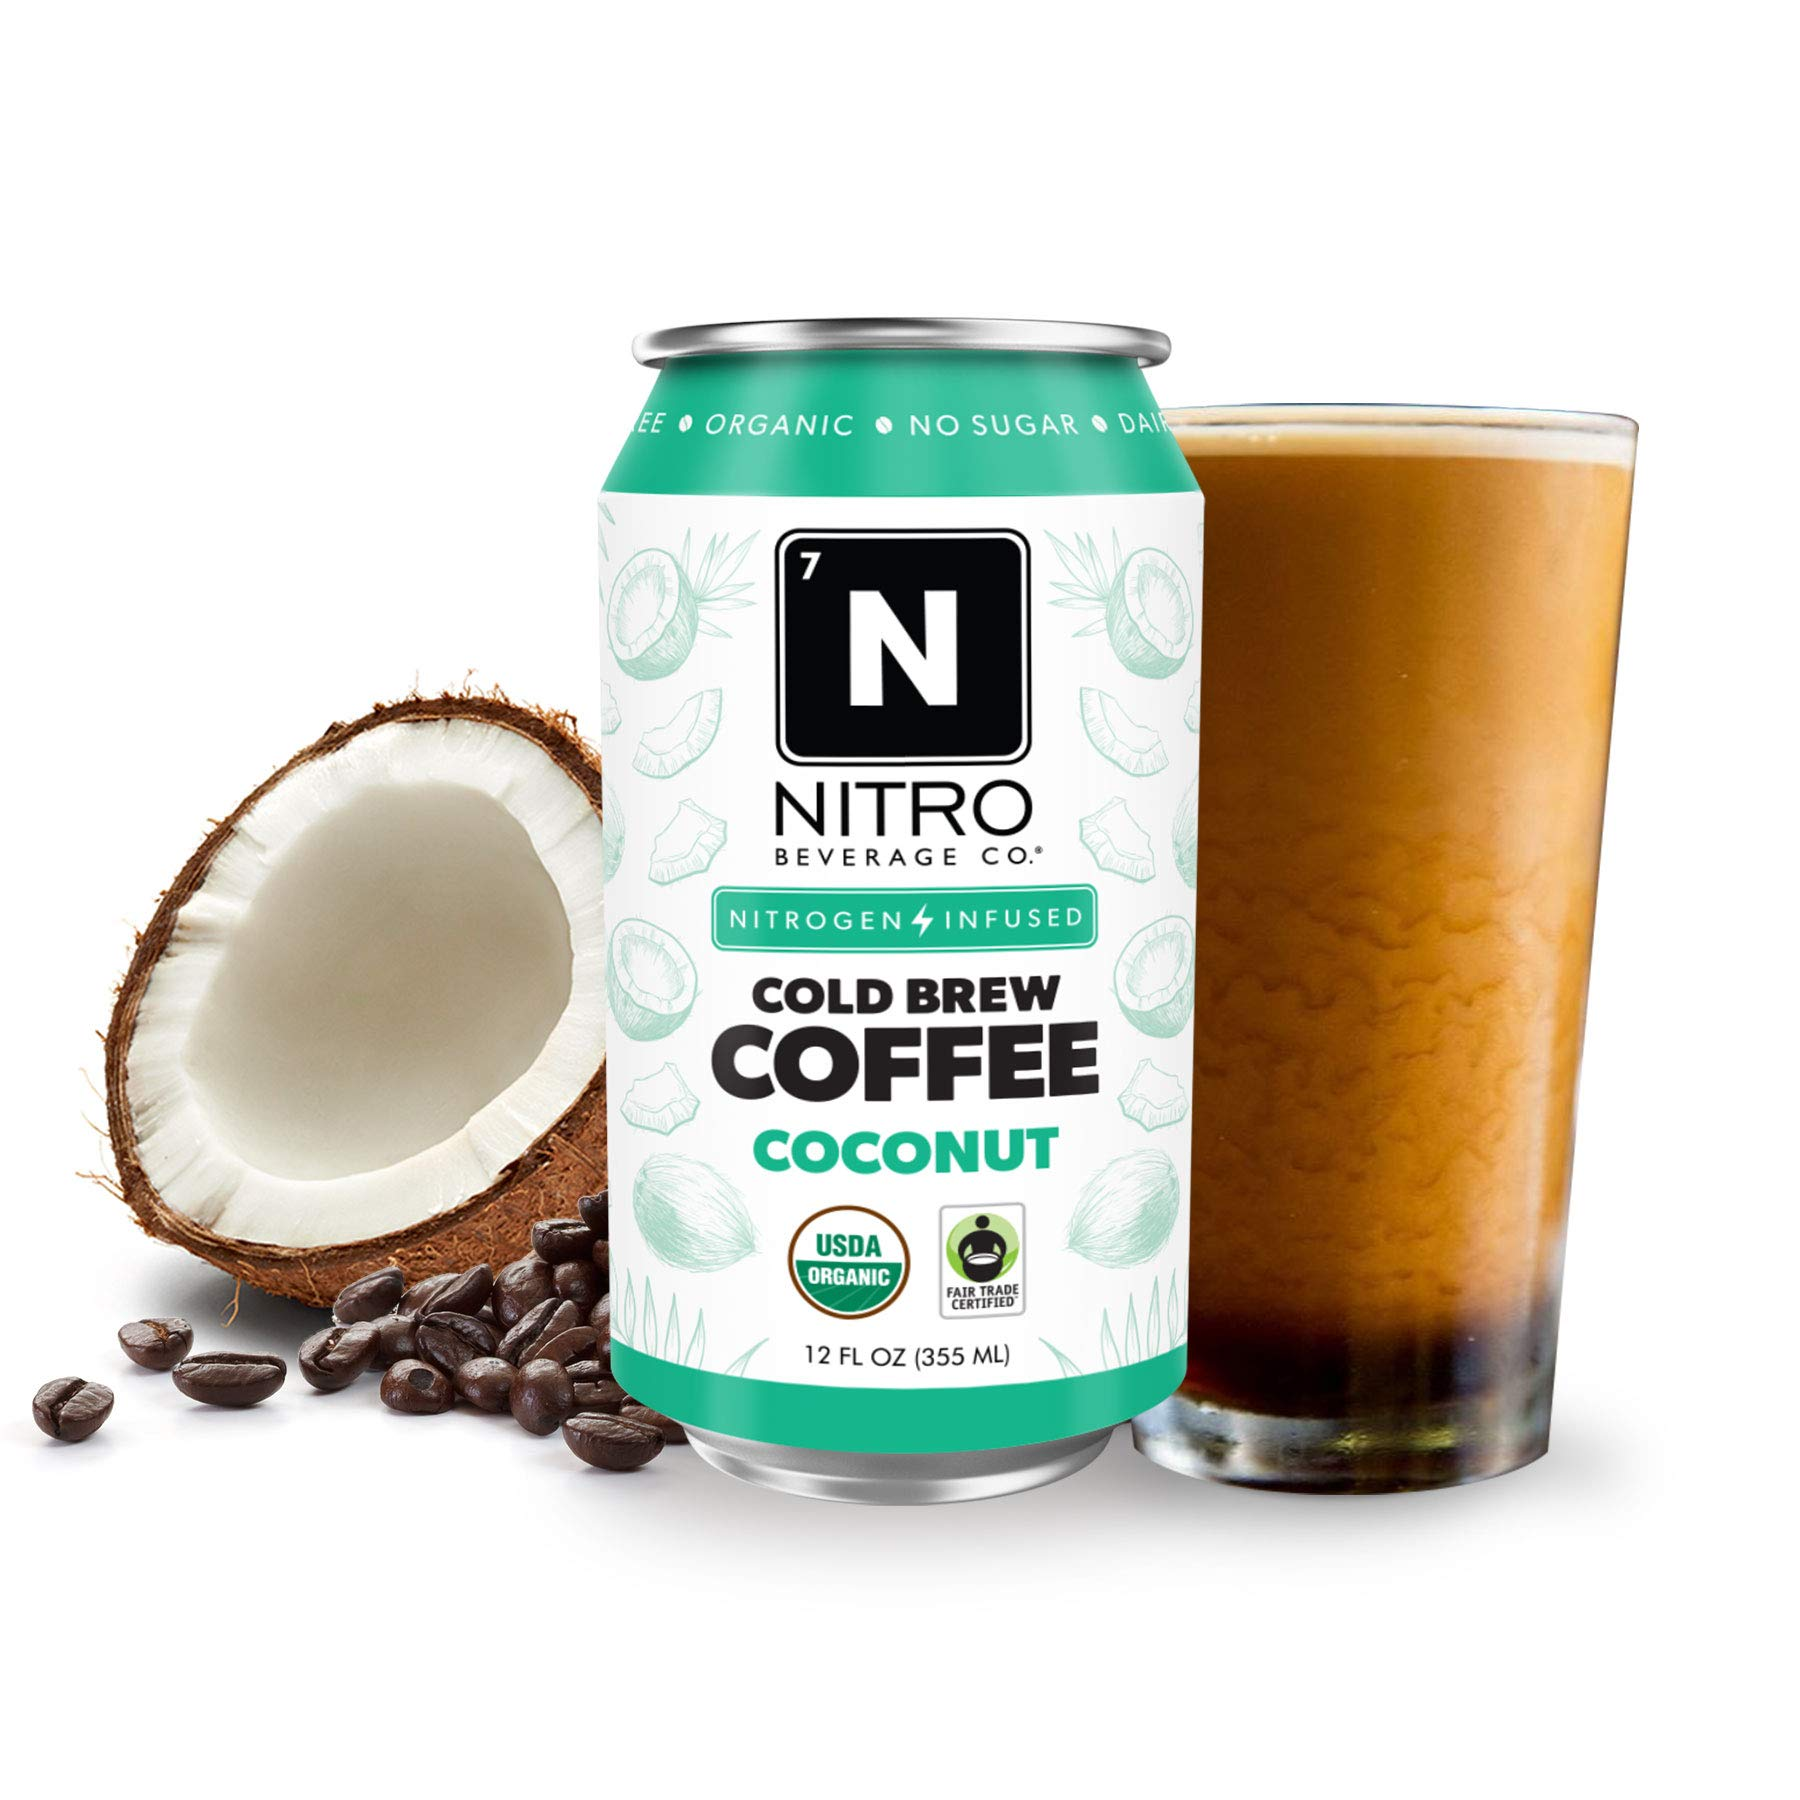 NITRO Beverage Co. | 12-Pack (12 fl oz) | Coconut NITRO Cold Brew Coffee | Certified Organic & Fair-Trade | Sugar Free, Dairy Free, Zero Calories | Always Cold, Always Fresh by NITRO Beverage Co.